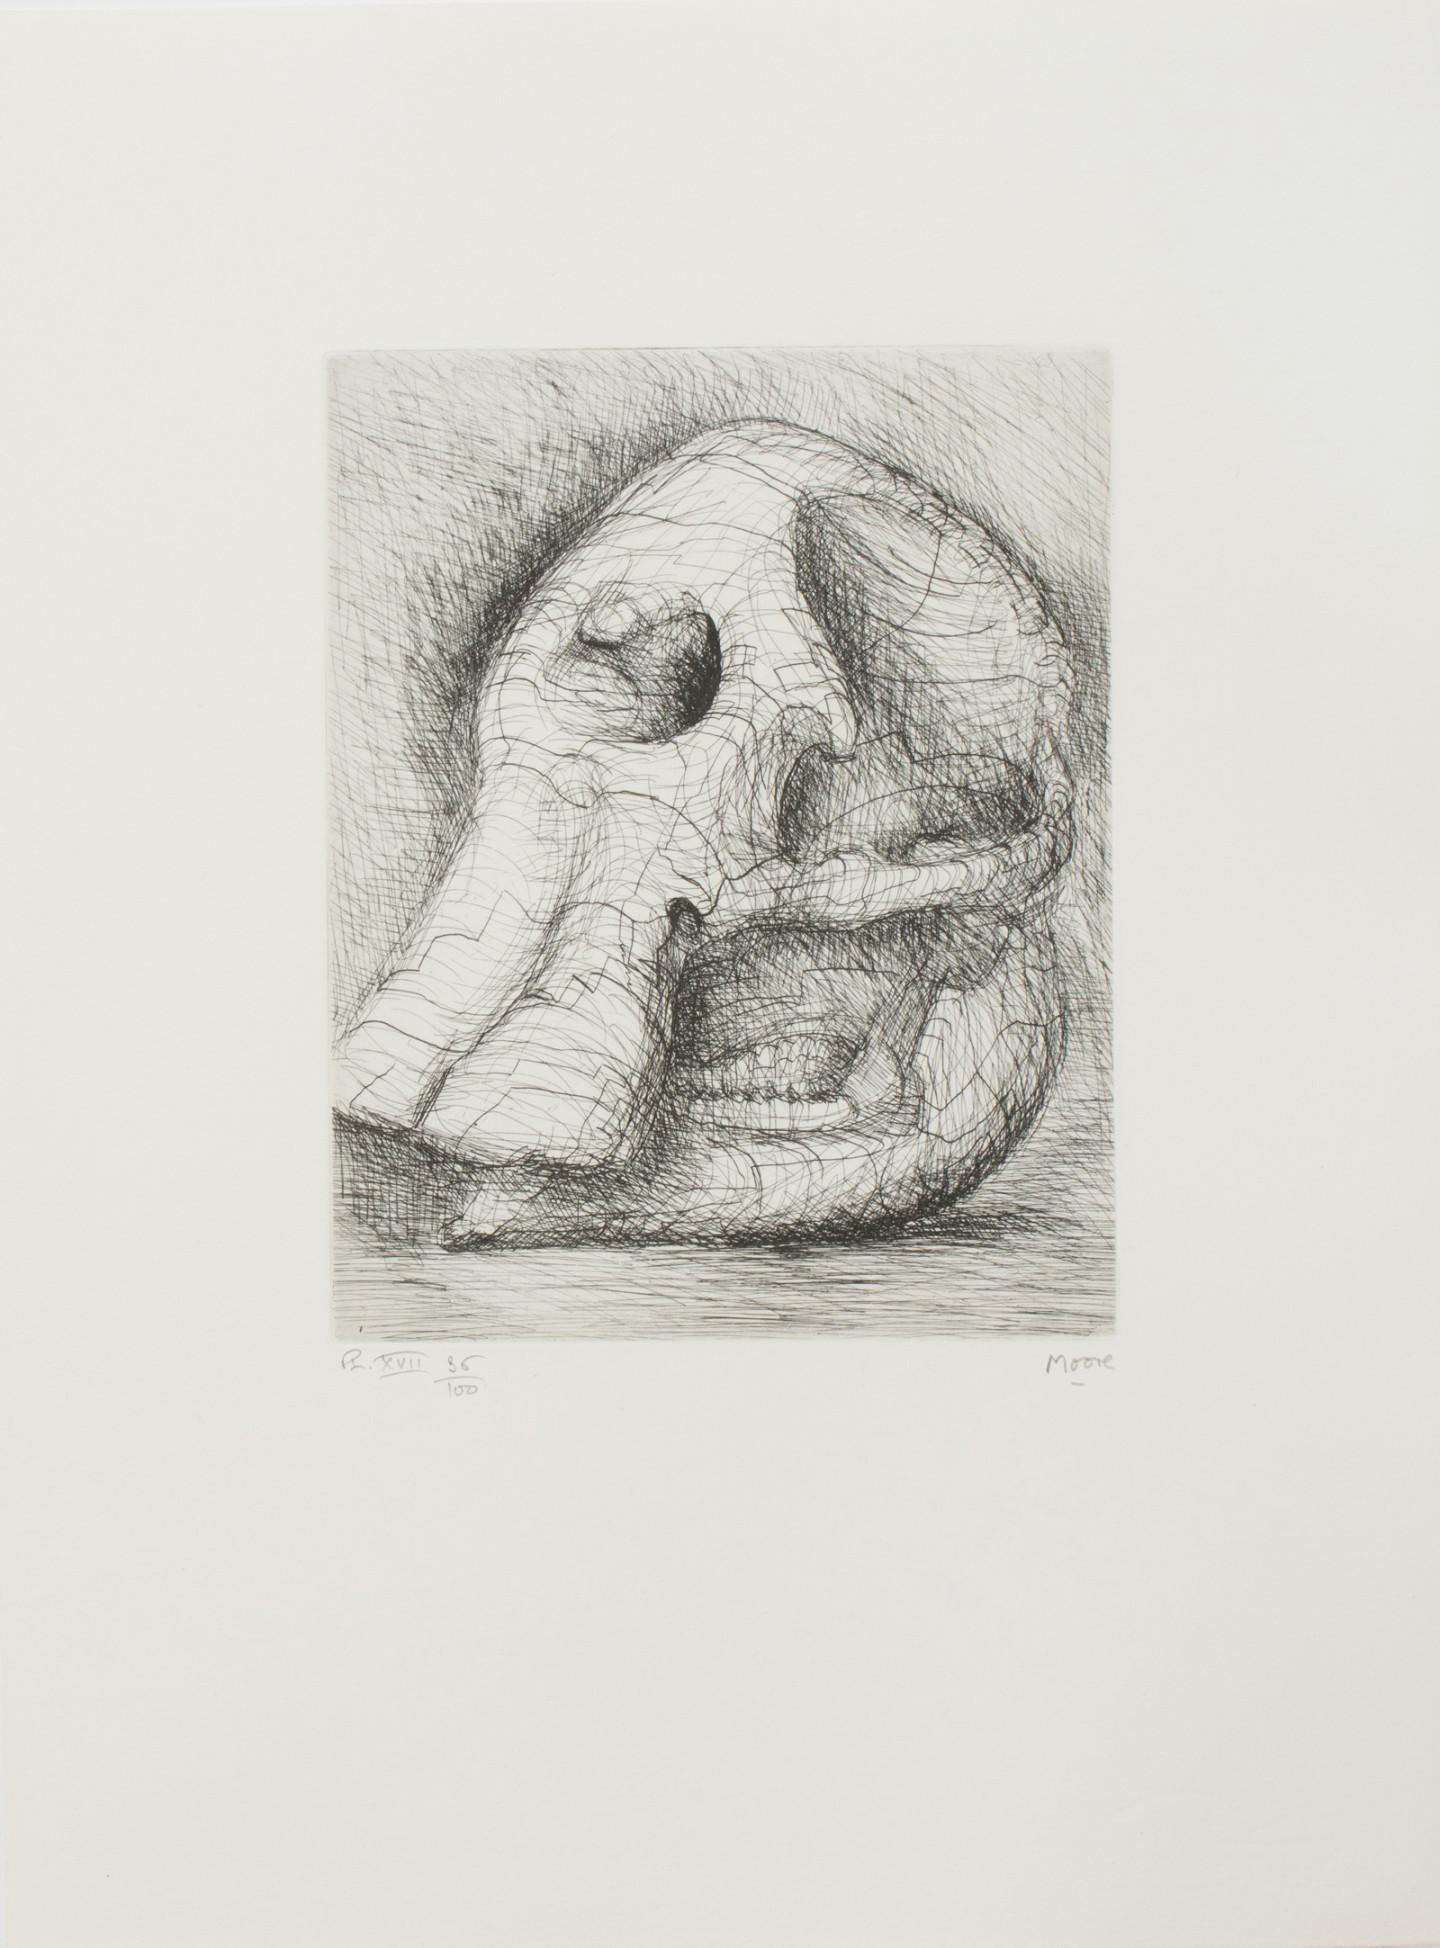 Генри Мур. Офорт. 1970. Иллюстрация к изданию Генри Мур. «Череп слона»